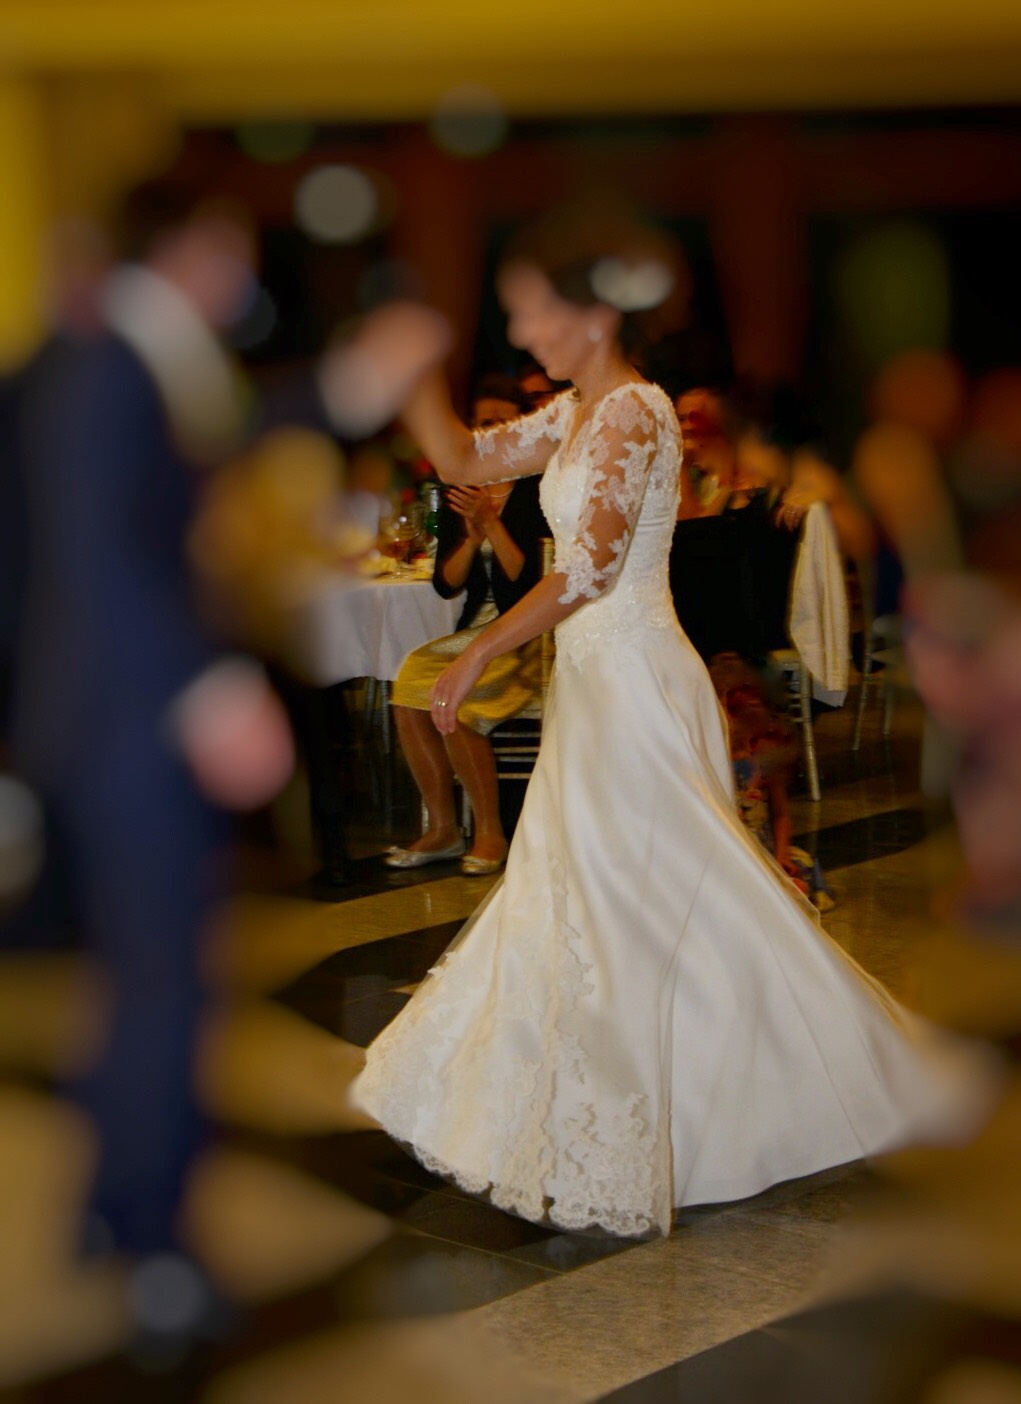 svadobné šaty od známej návrhárky - Obrázok č. 2